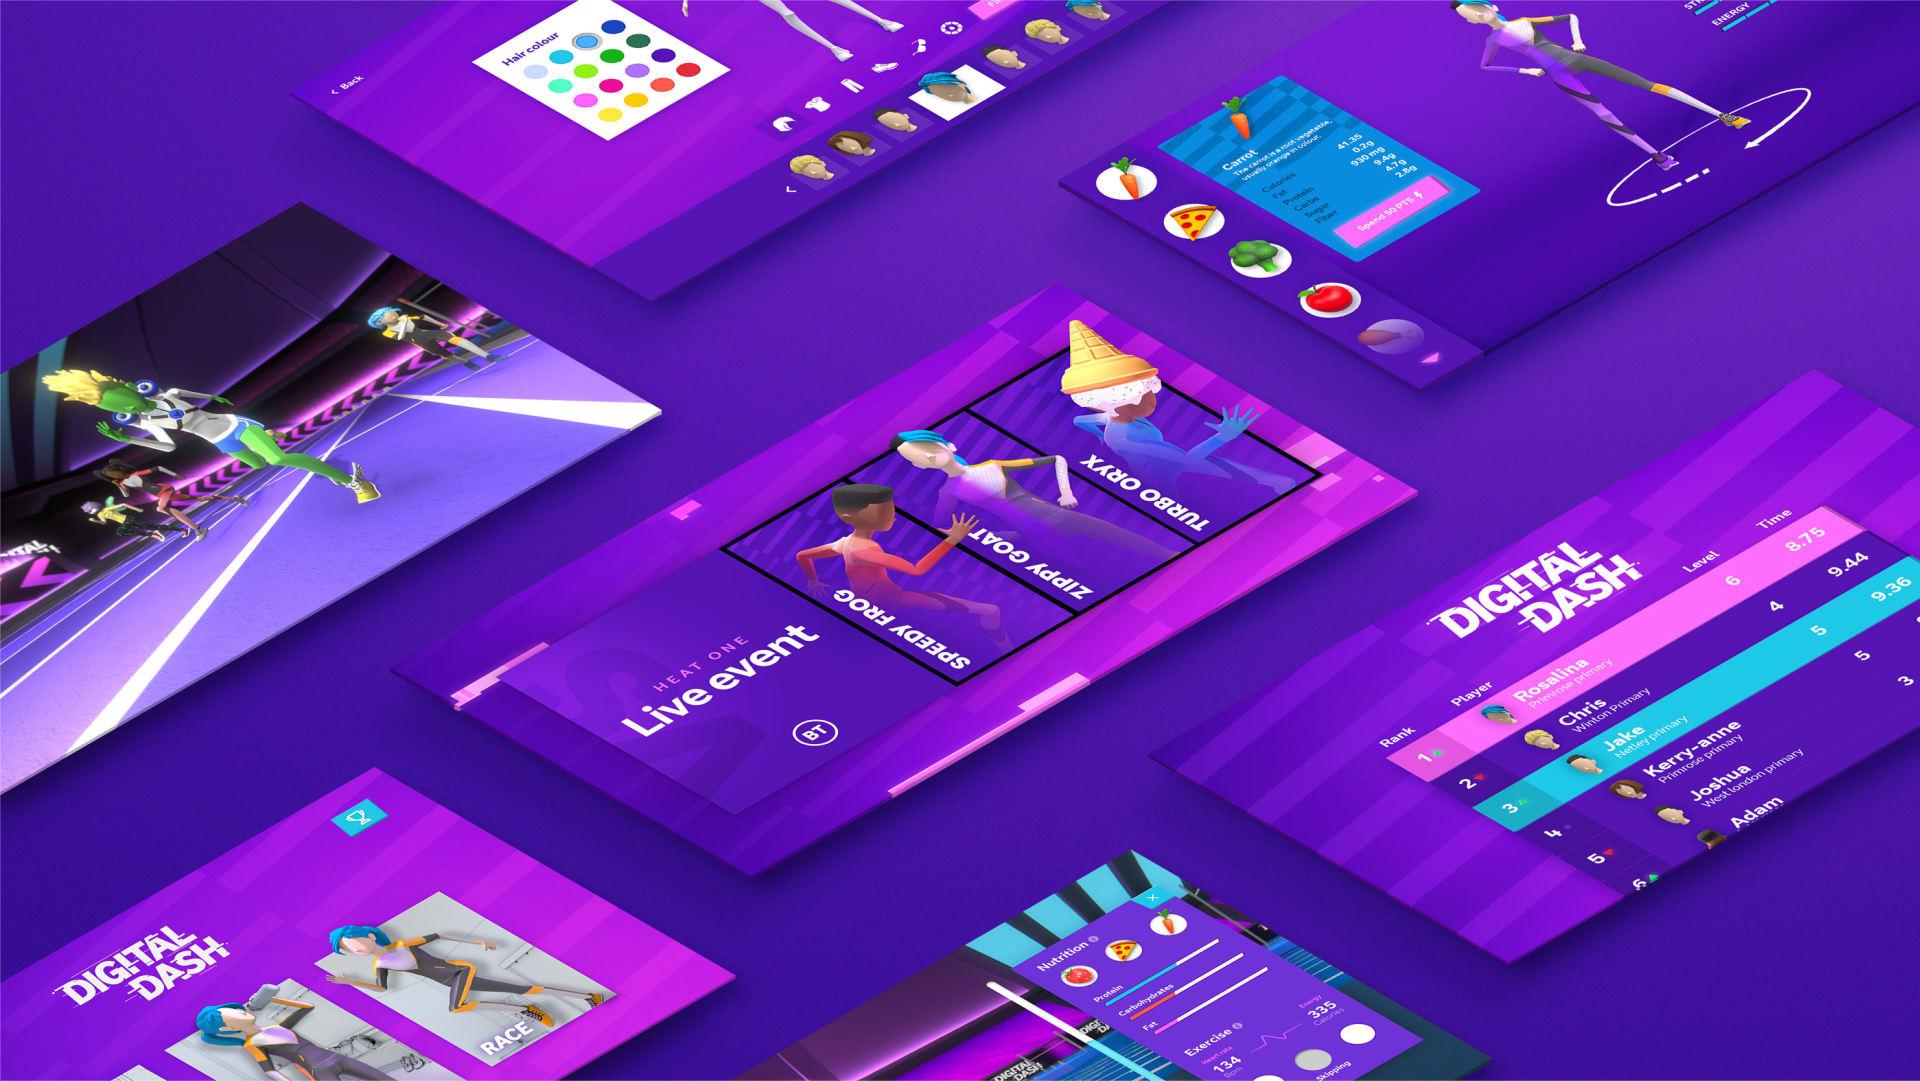 lots of monitors on purple background